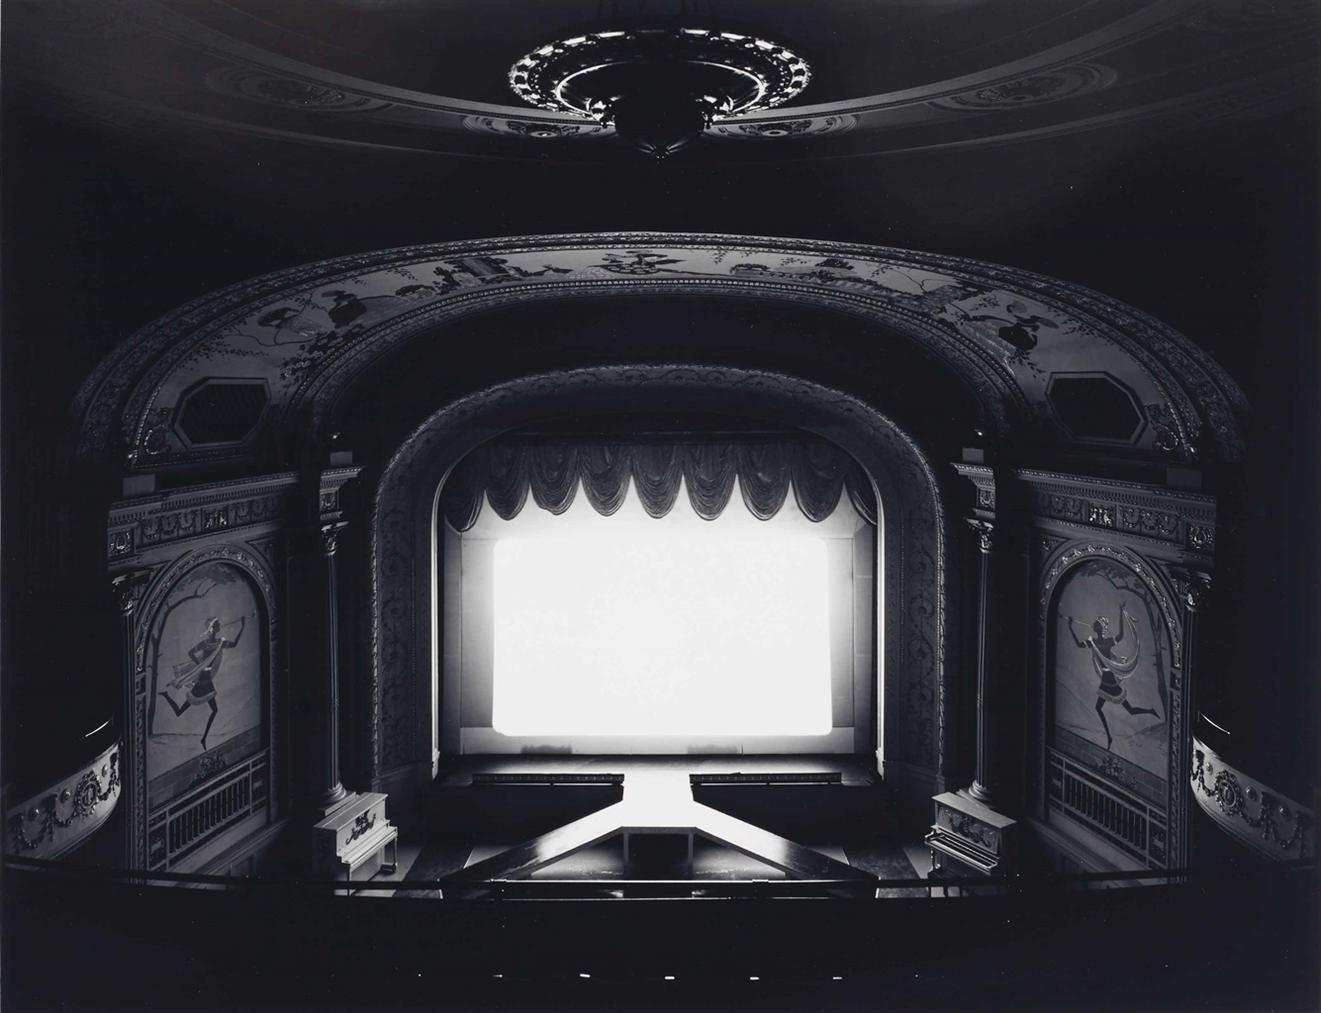 Hiroshi Sugimoto-Cabot Street Cinema, Mass-1978